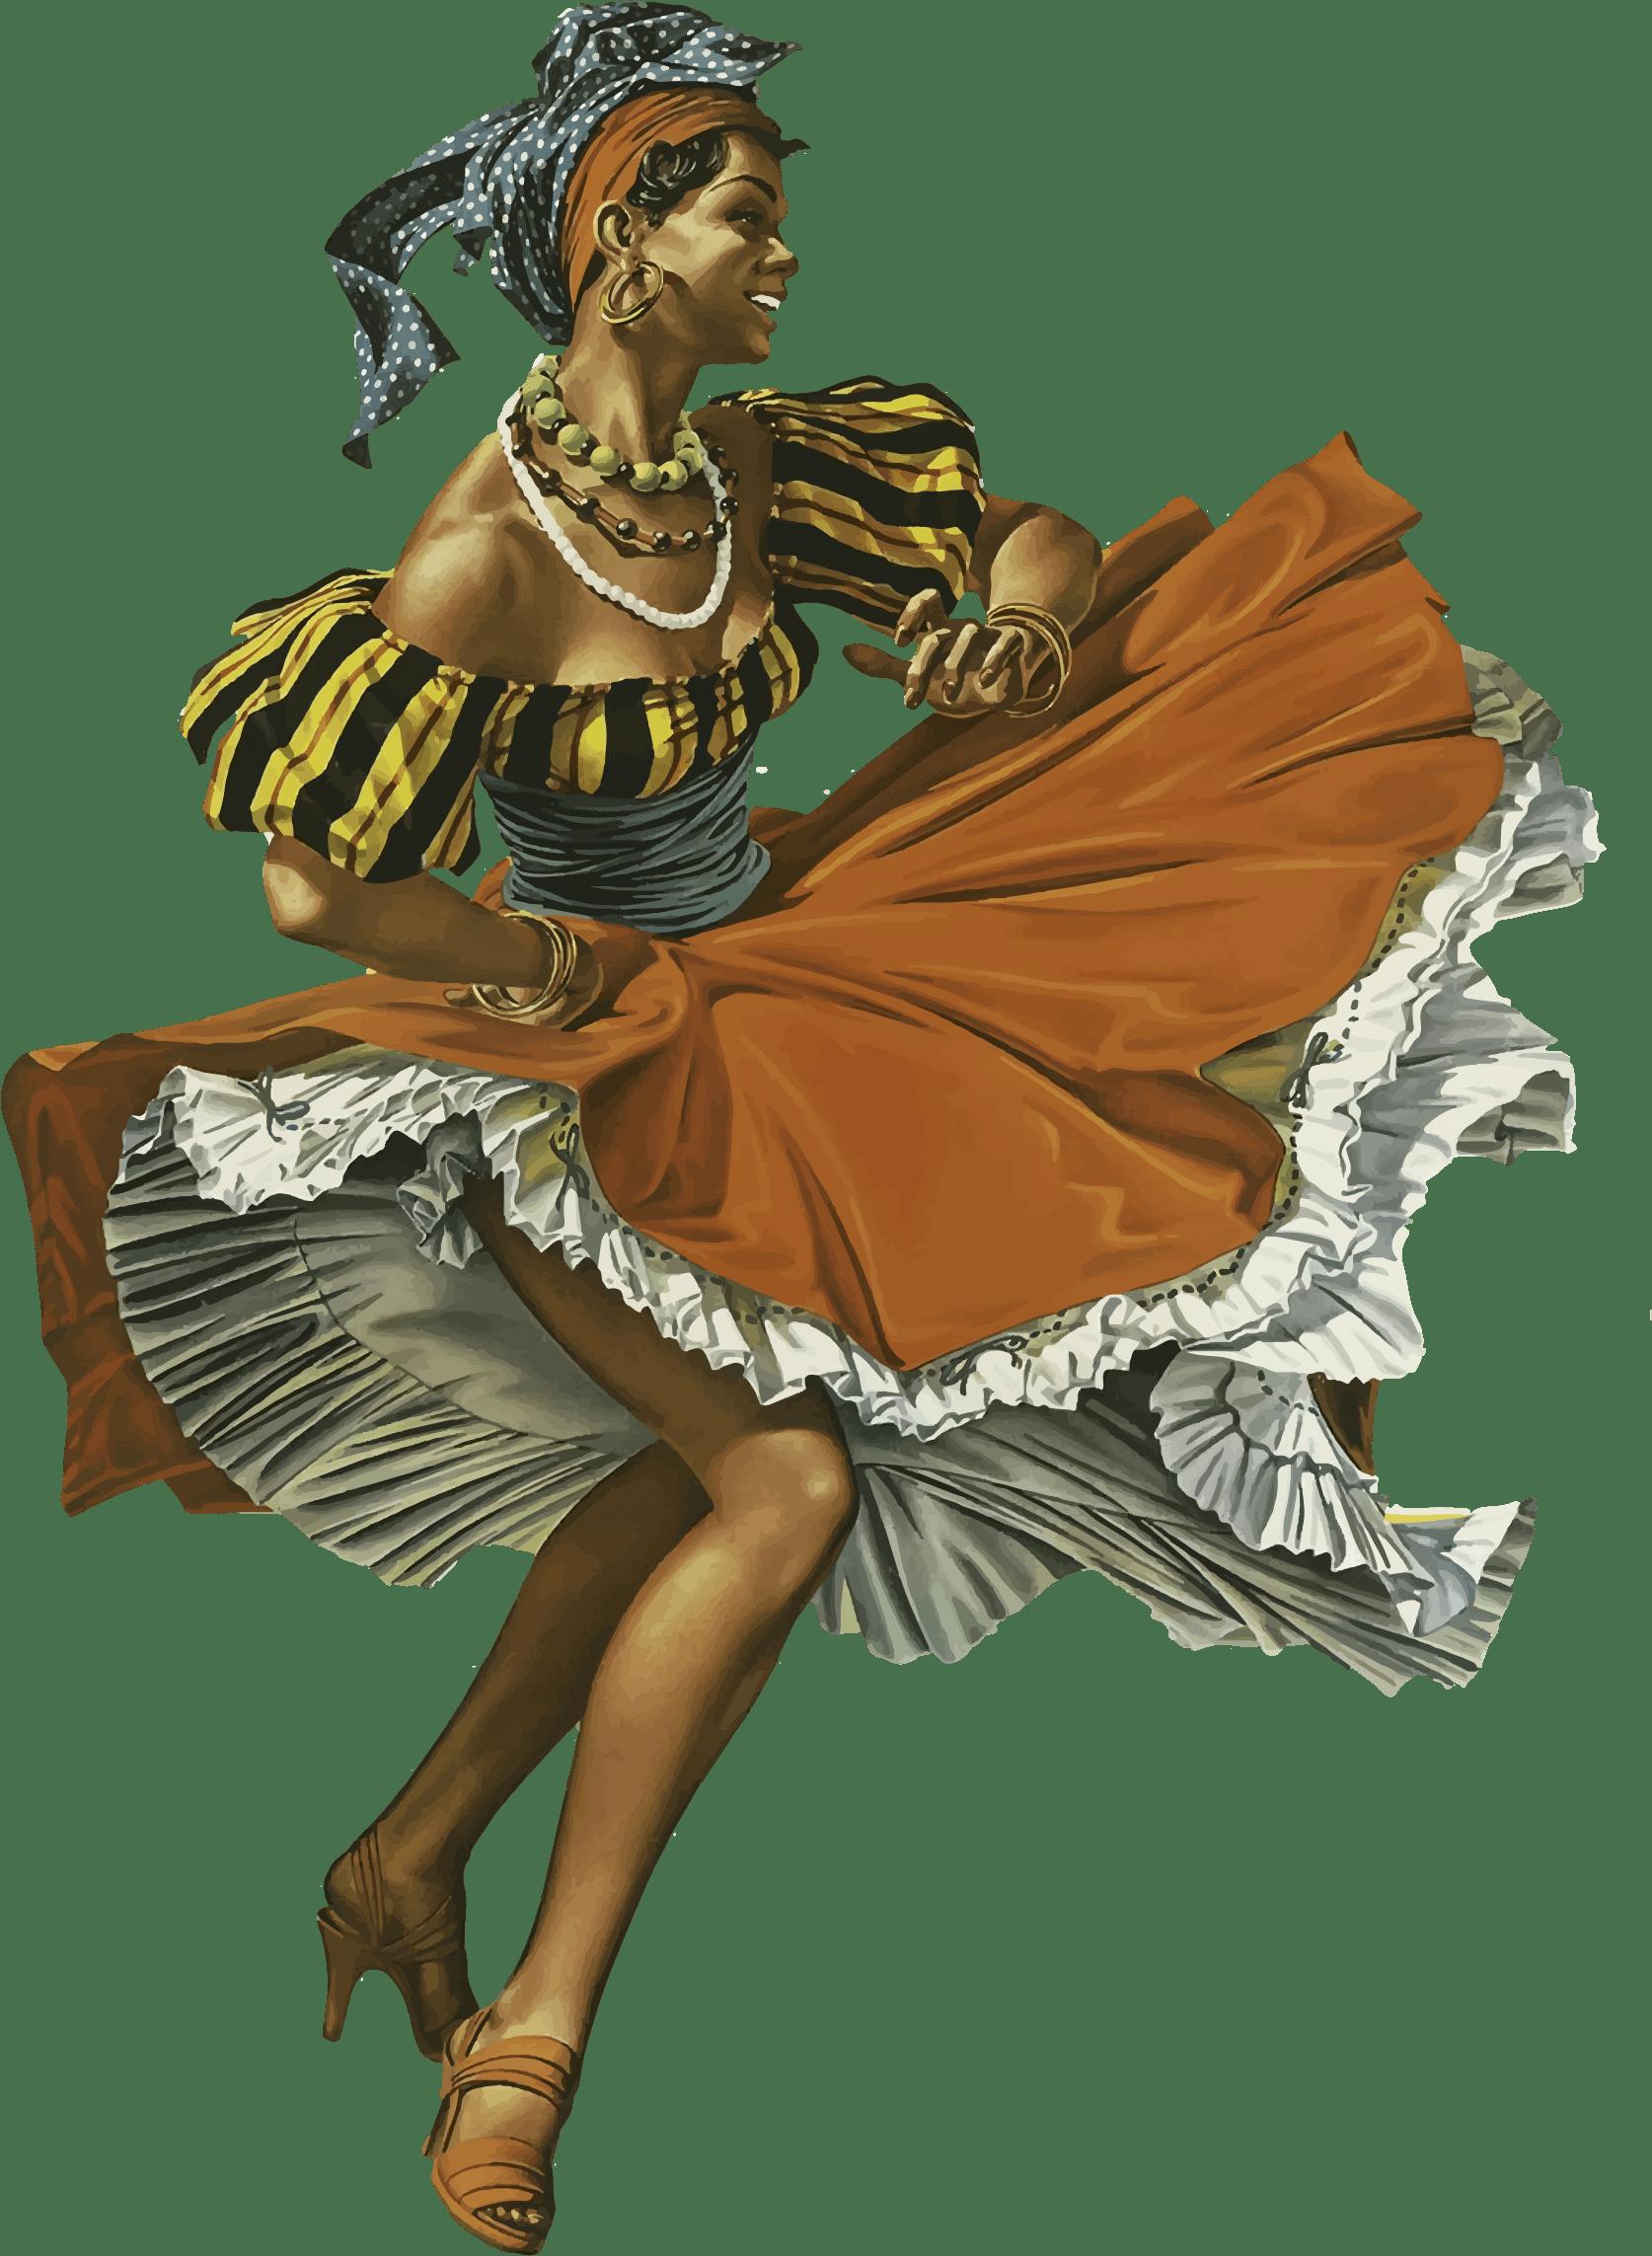 Dancer caribbean transparent png. Clipart dance vintage